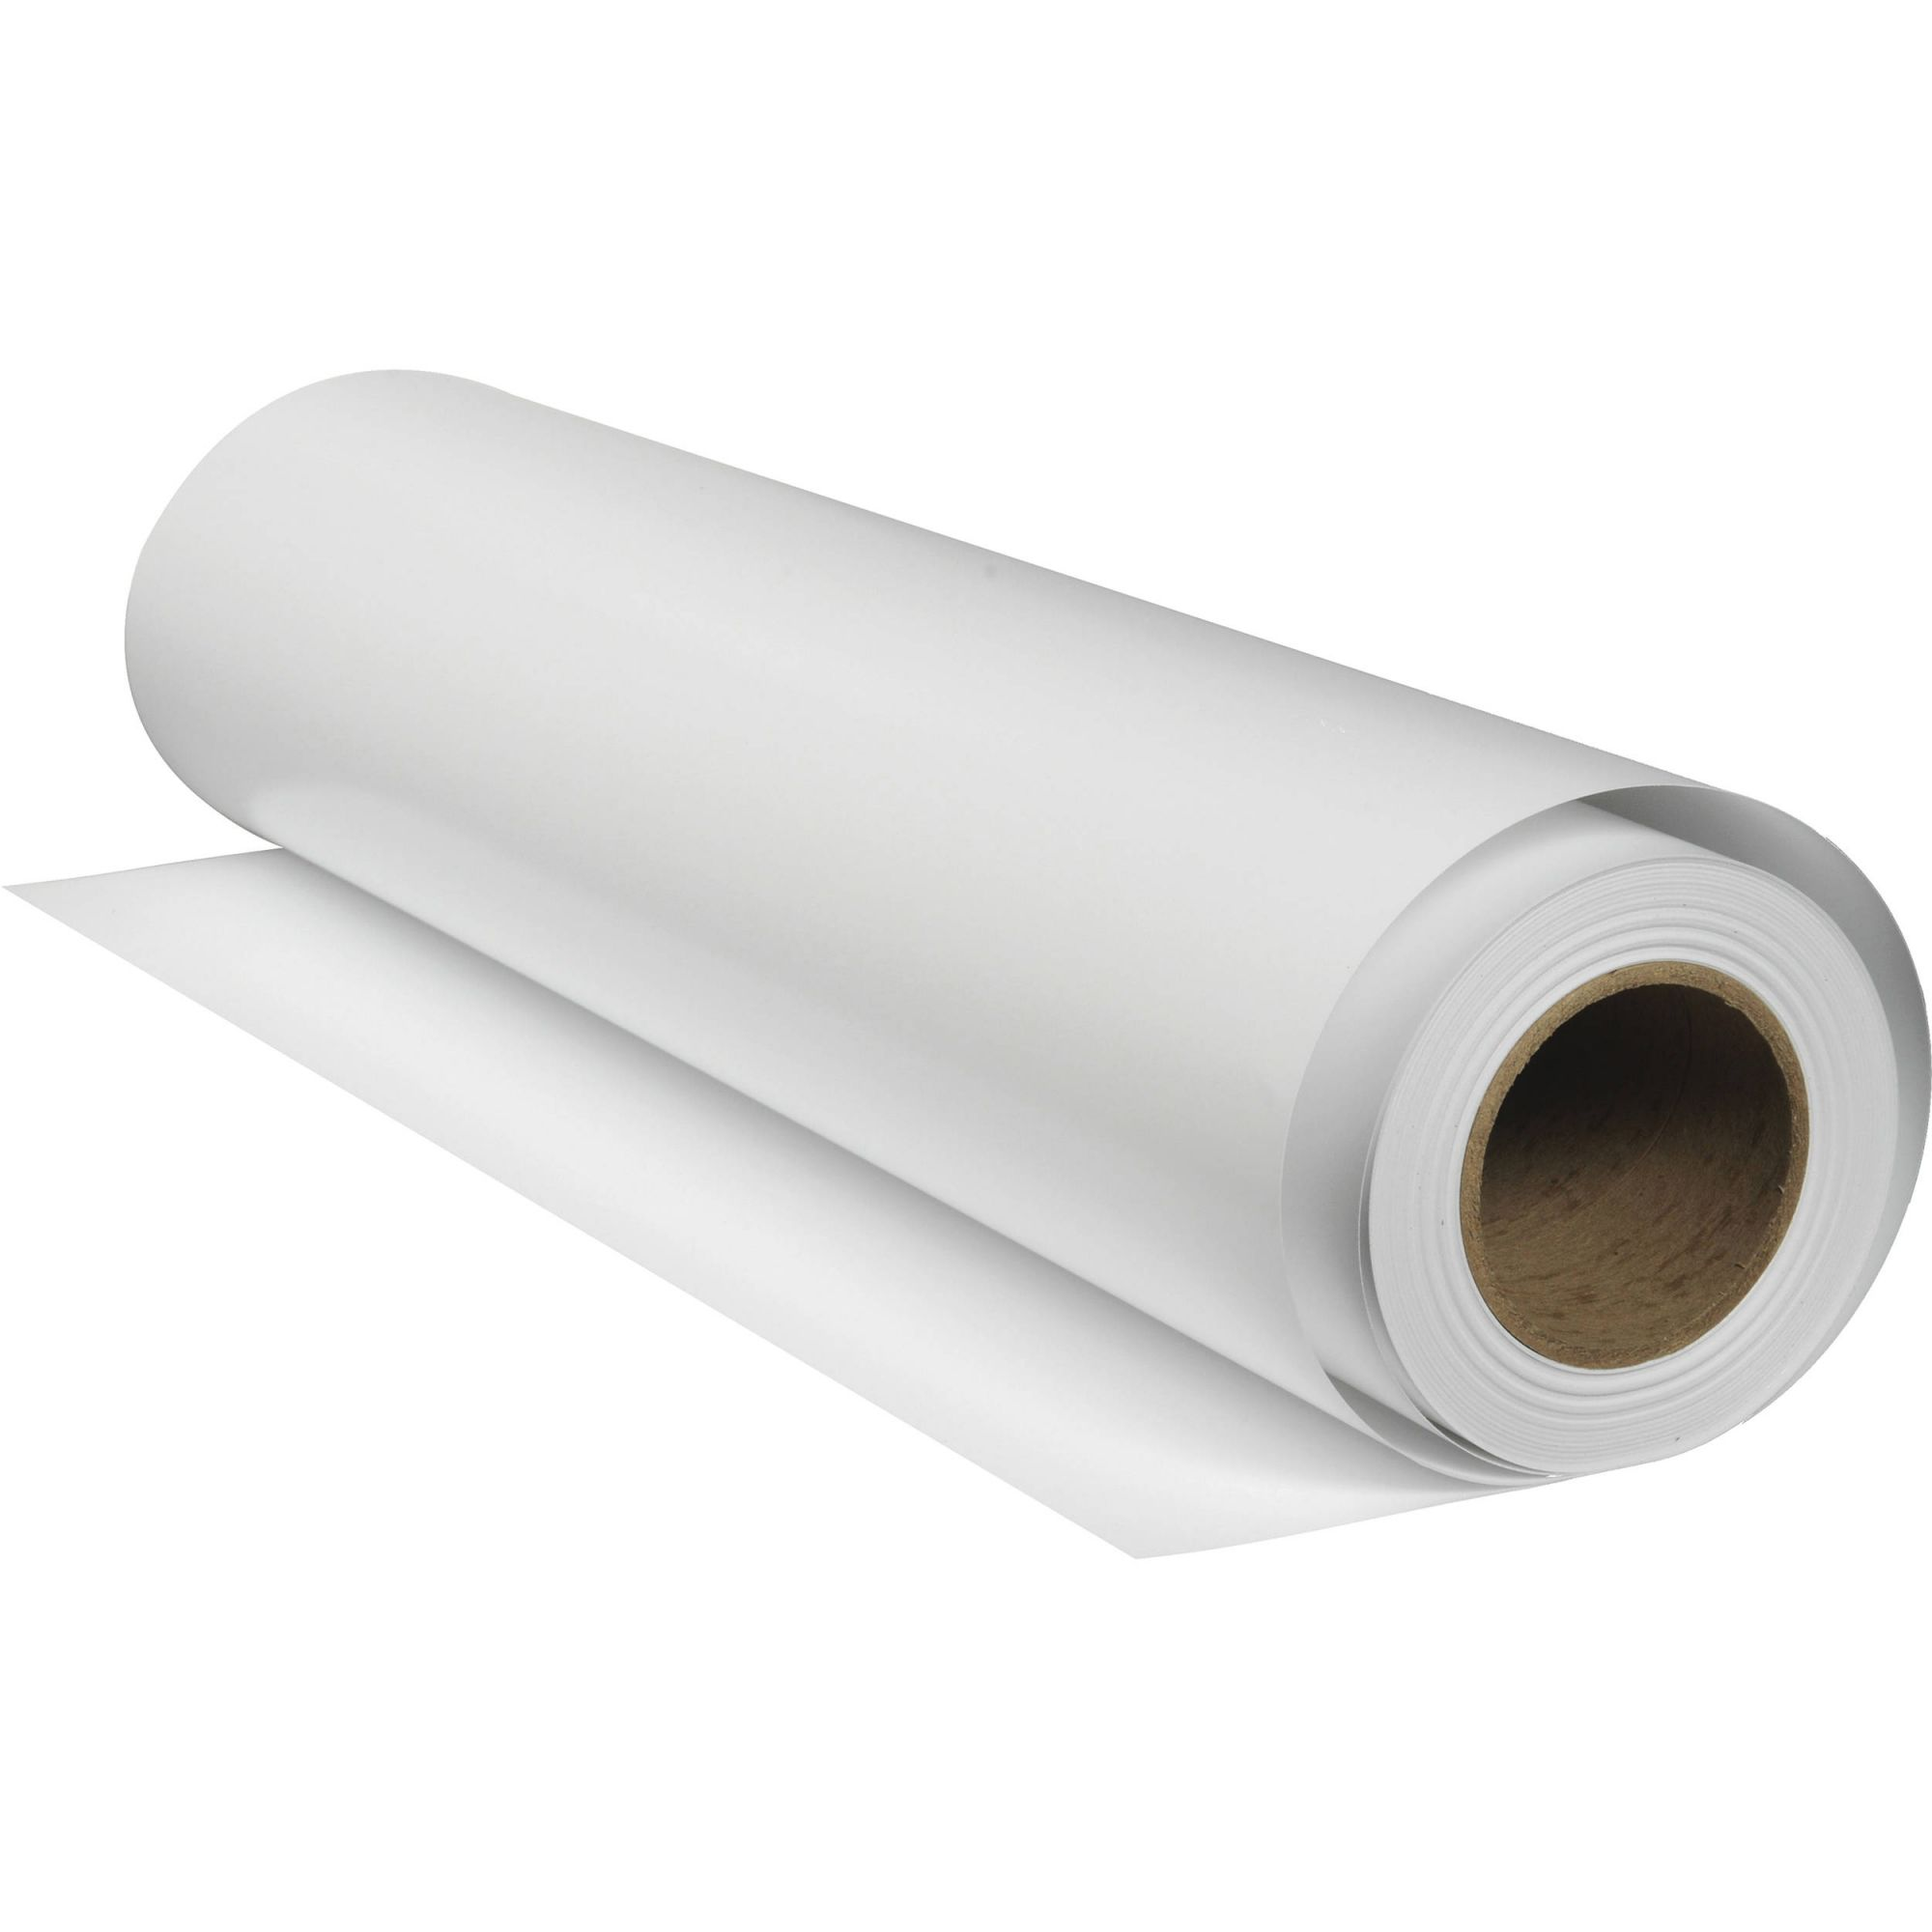 OBM Sublitex - Tecido termocolante para camisetas escuras- 46 cm